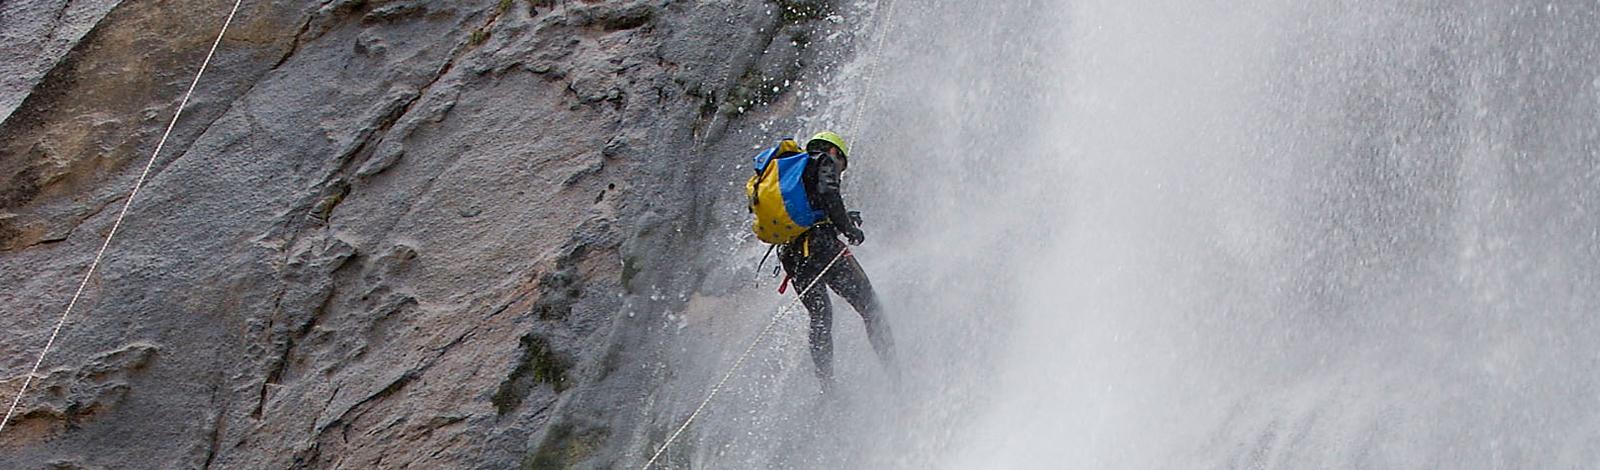 topo canyoning 4